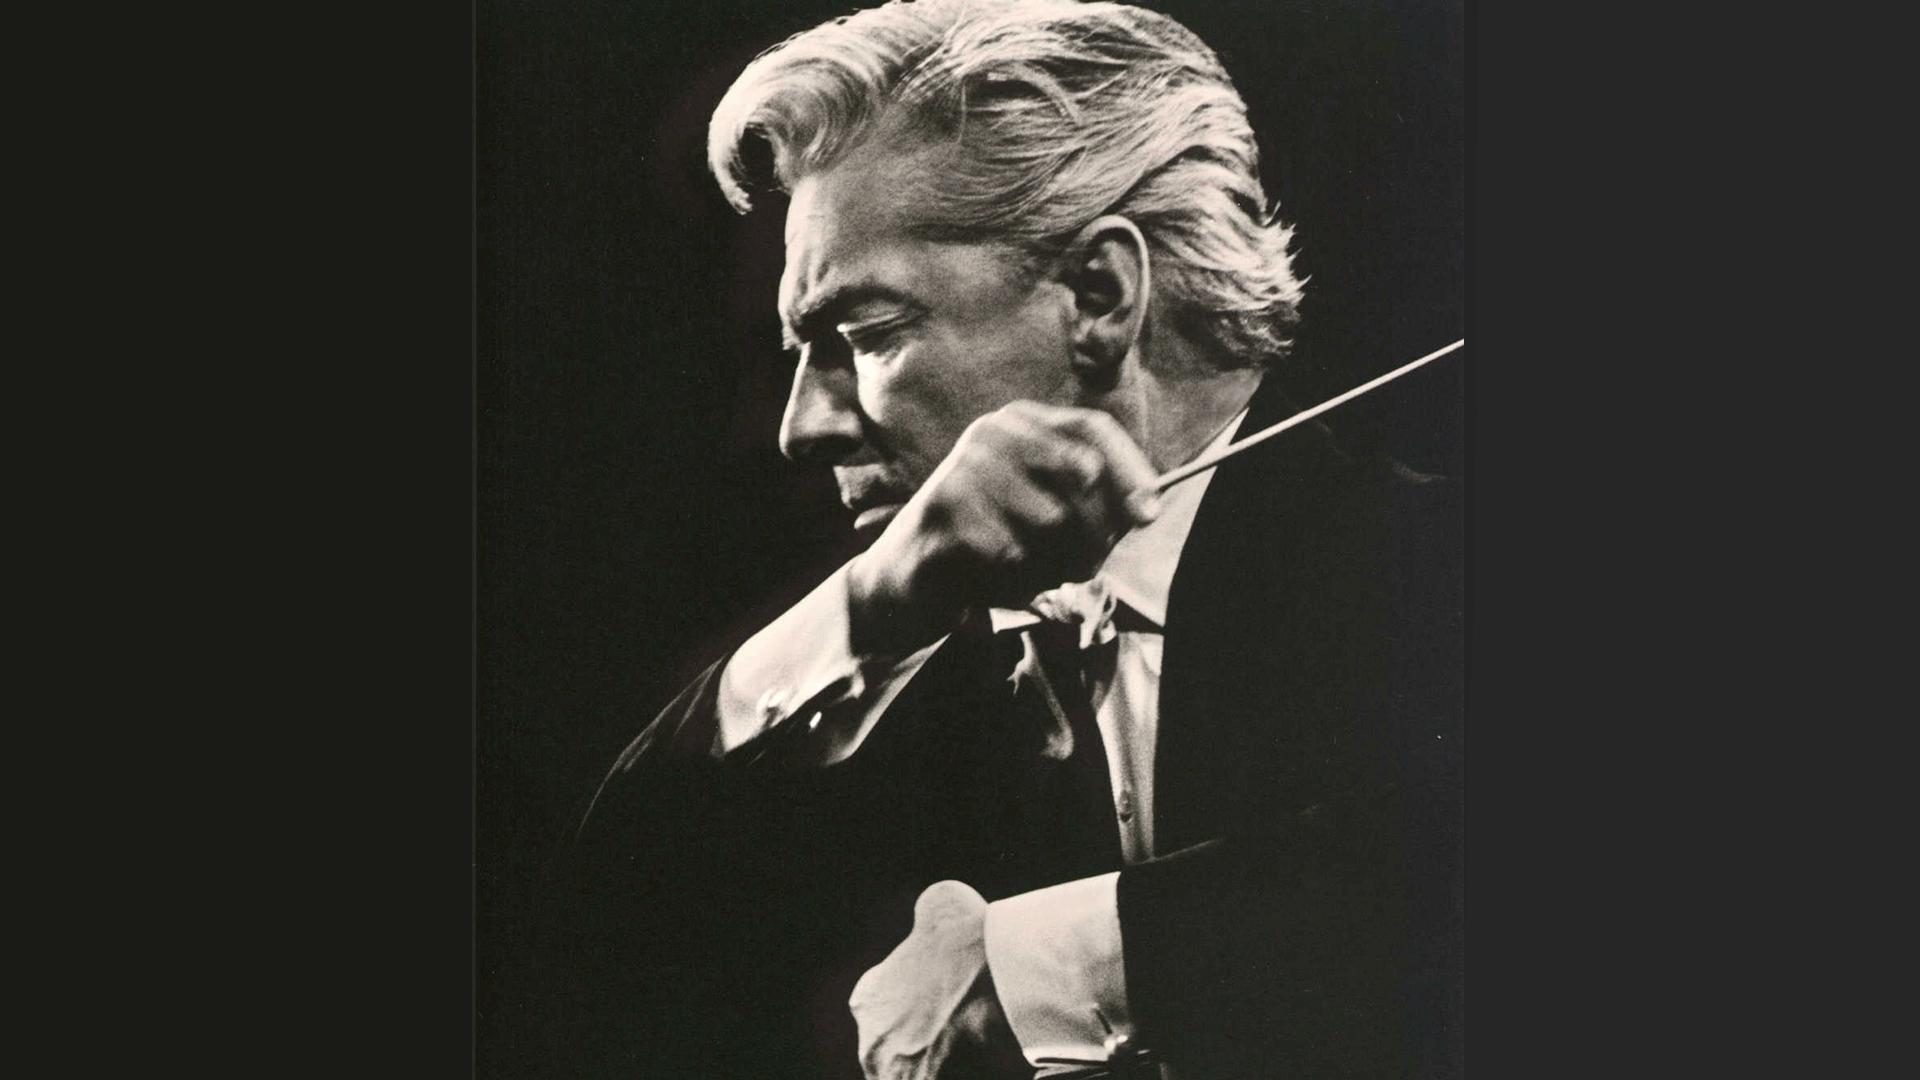 Herbert von Karajan conducts Bruckner's Symphony No. 9